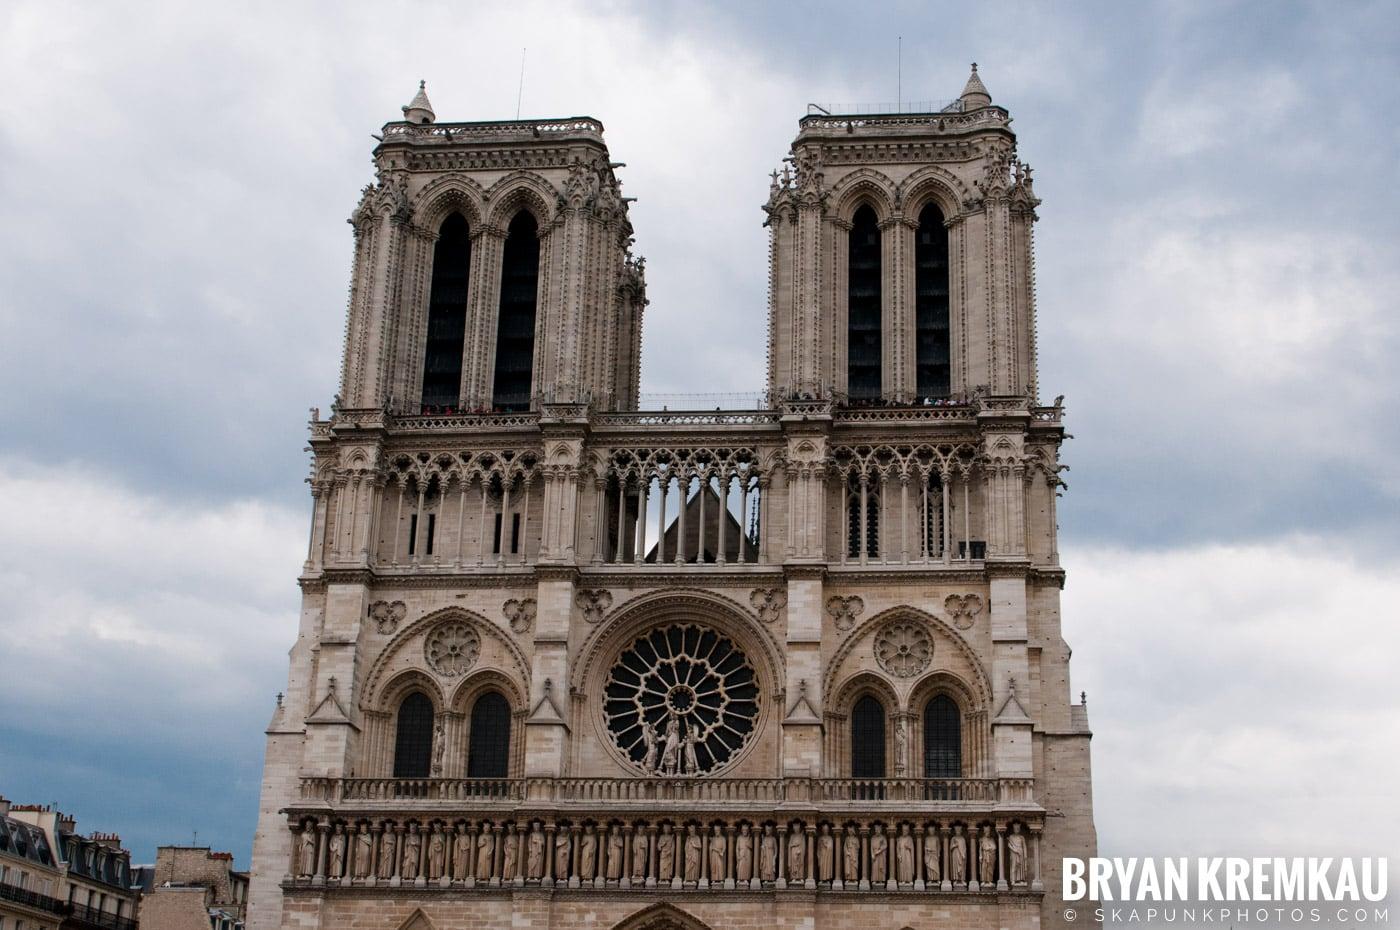 Paris, France Honeymoon - Day 4 - 7.21.11 (5)